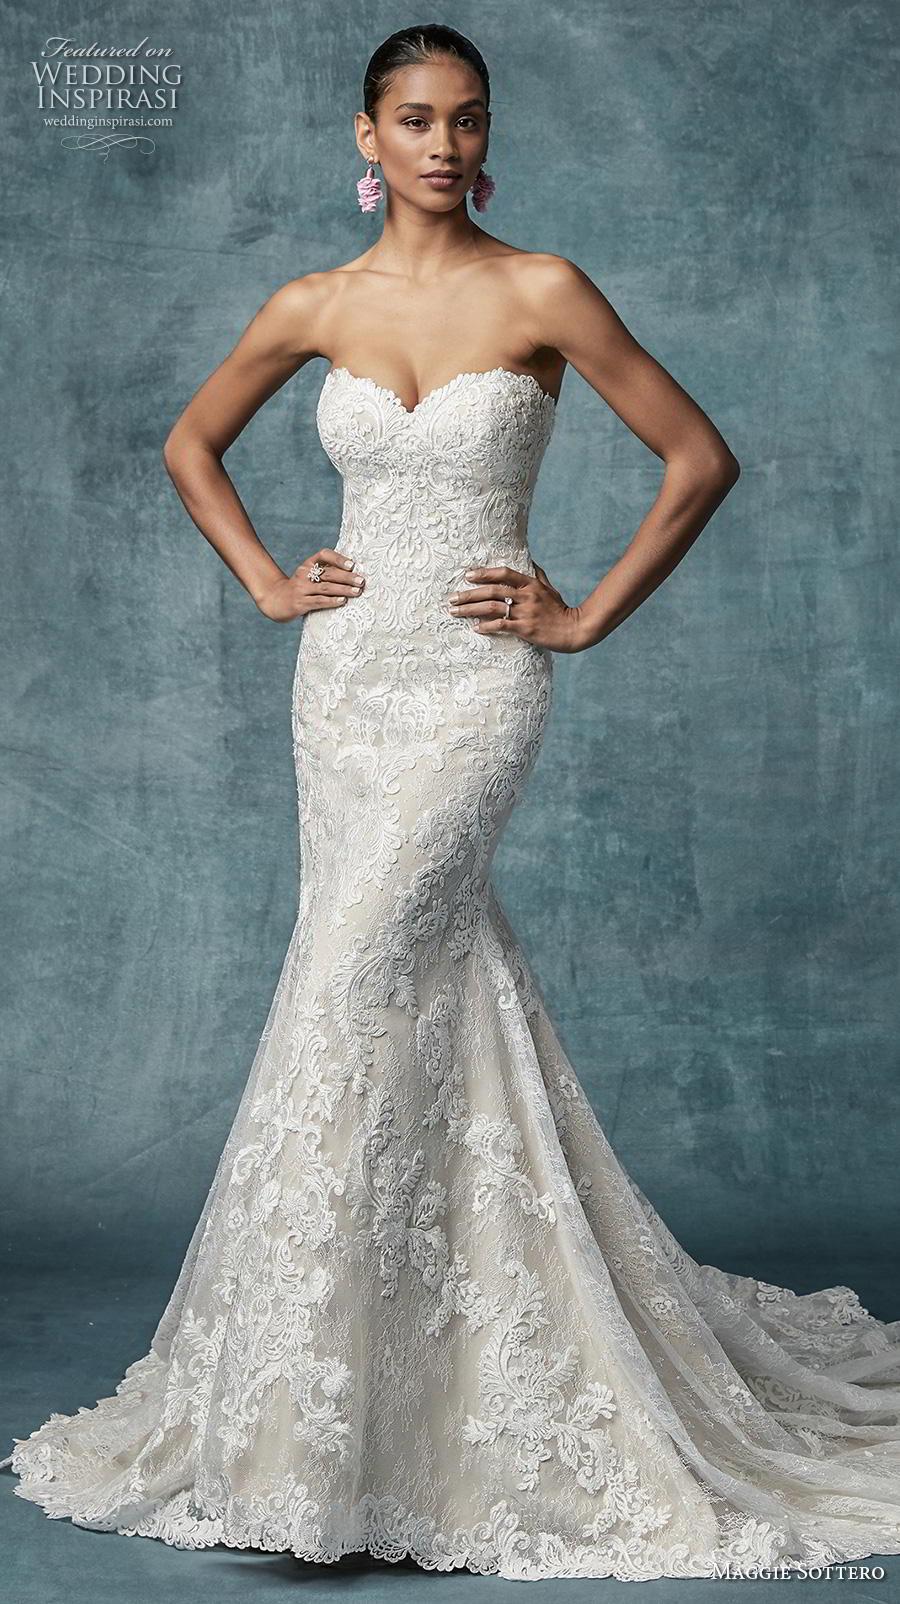 132e4ec3d60 maggie sottero spring 2019 bridal strapless sweetheart neckline full  embellishment elegant fit and flare wedding dress